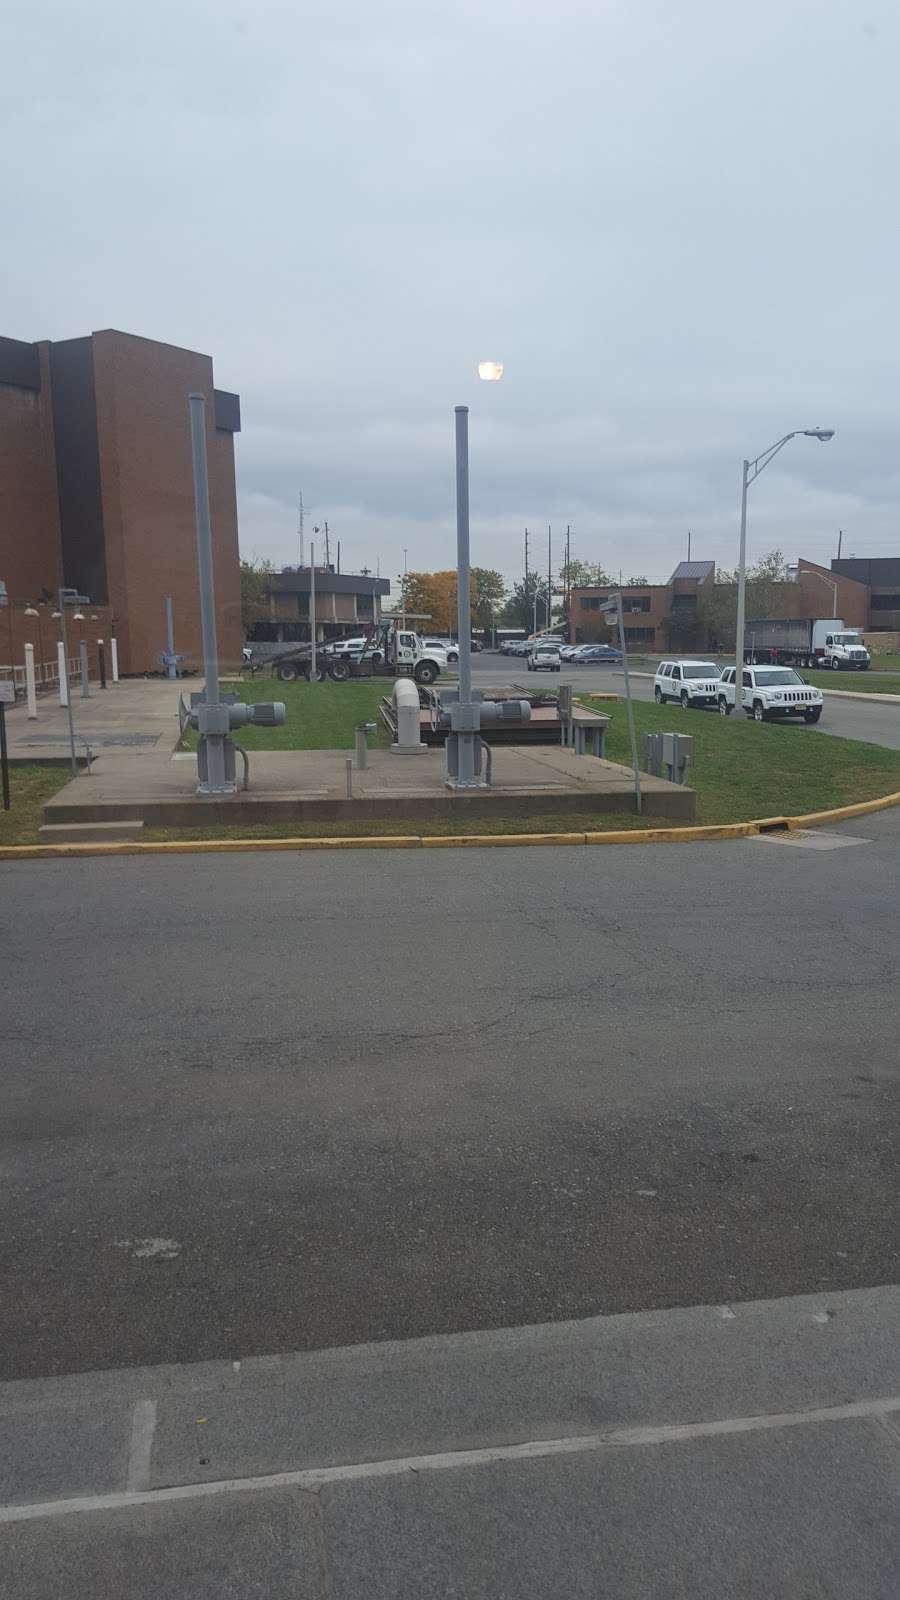 Passaic Vàlley - store  | Photo 4 of 6 | Address: 600 Wilson Ave, Newark, NJ 07105, USA | Phone: (973) 817-5858